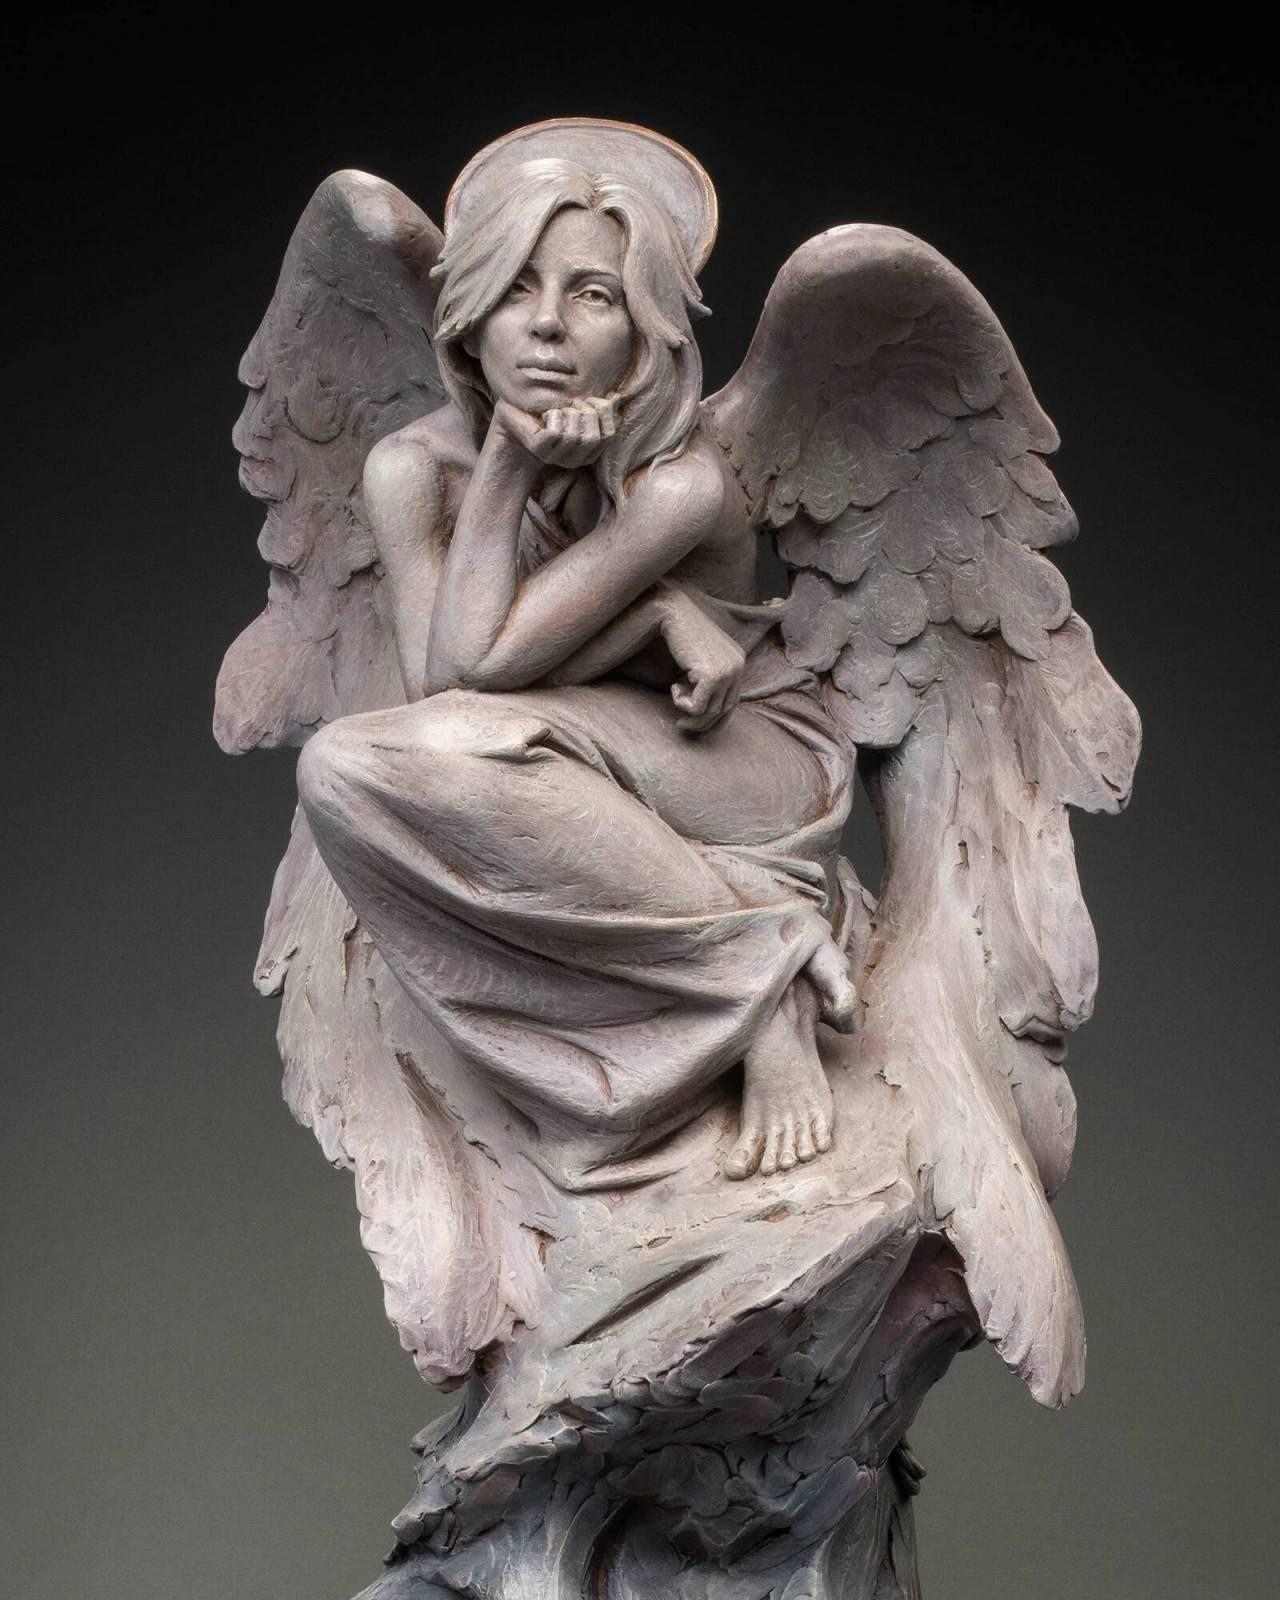 en Hammond An Angel in Contemplation